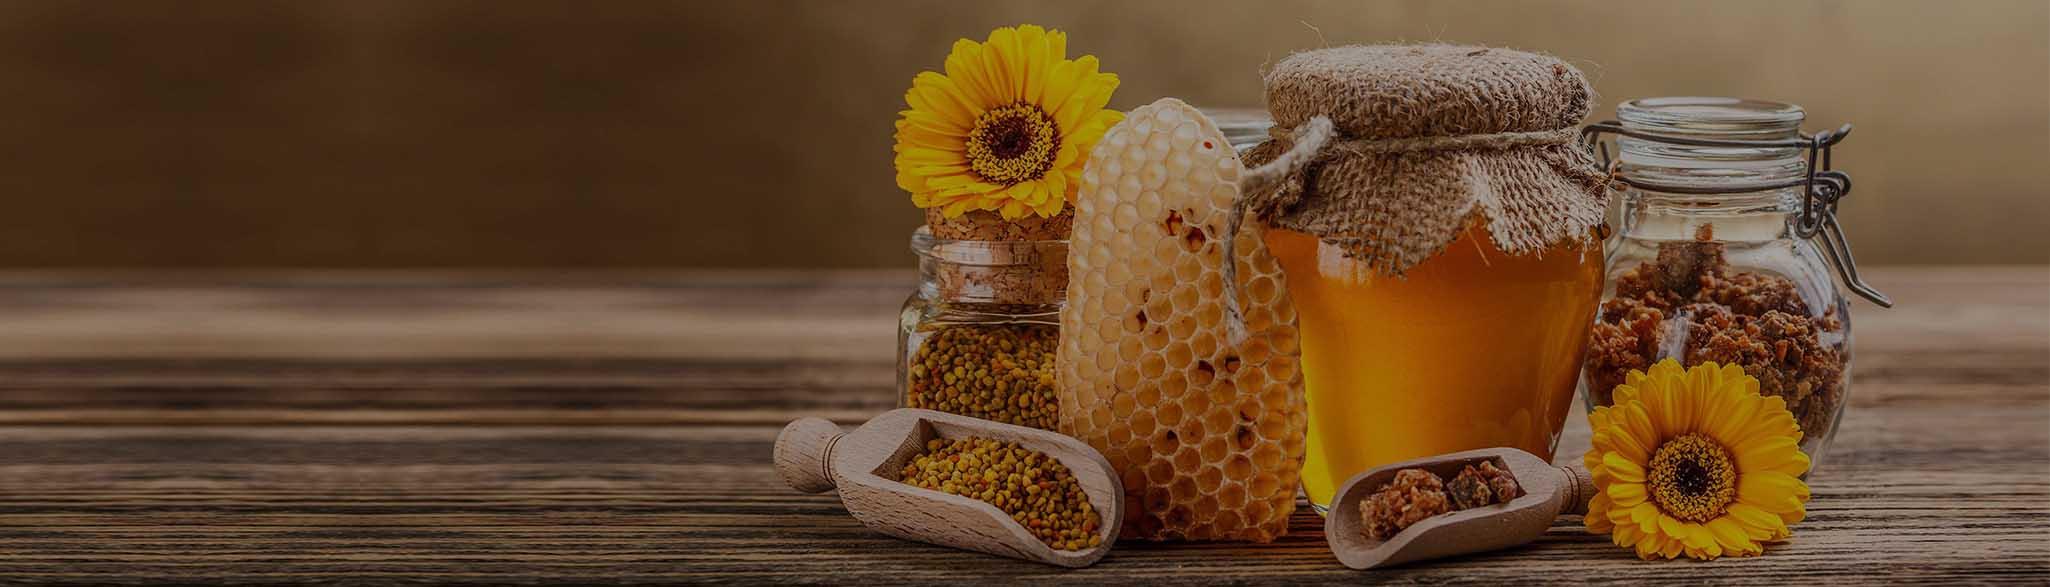 Buy Raw honey online in Dubai